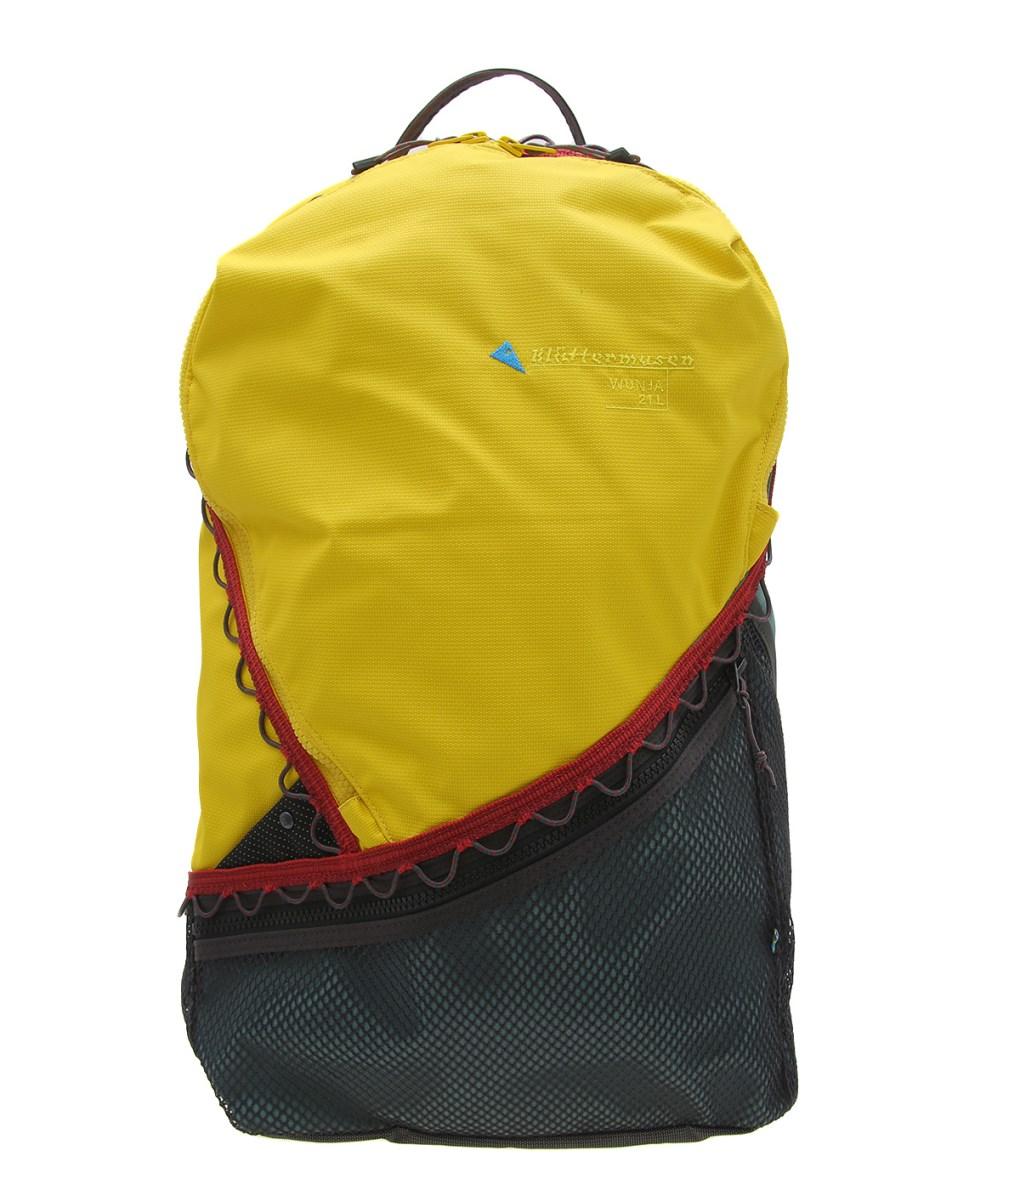 KLATTERMUSEN / クレッタルムーセン :Wunja Everyday Backpack 21L : エブリデイ バックパック リュック : 40405U01 【PIE】